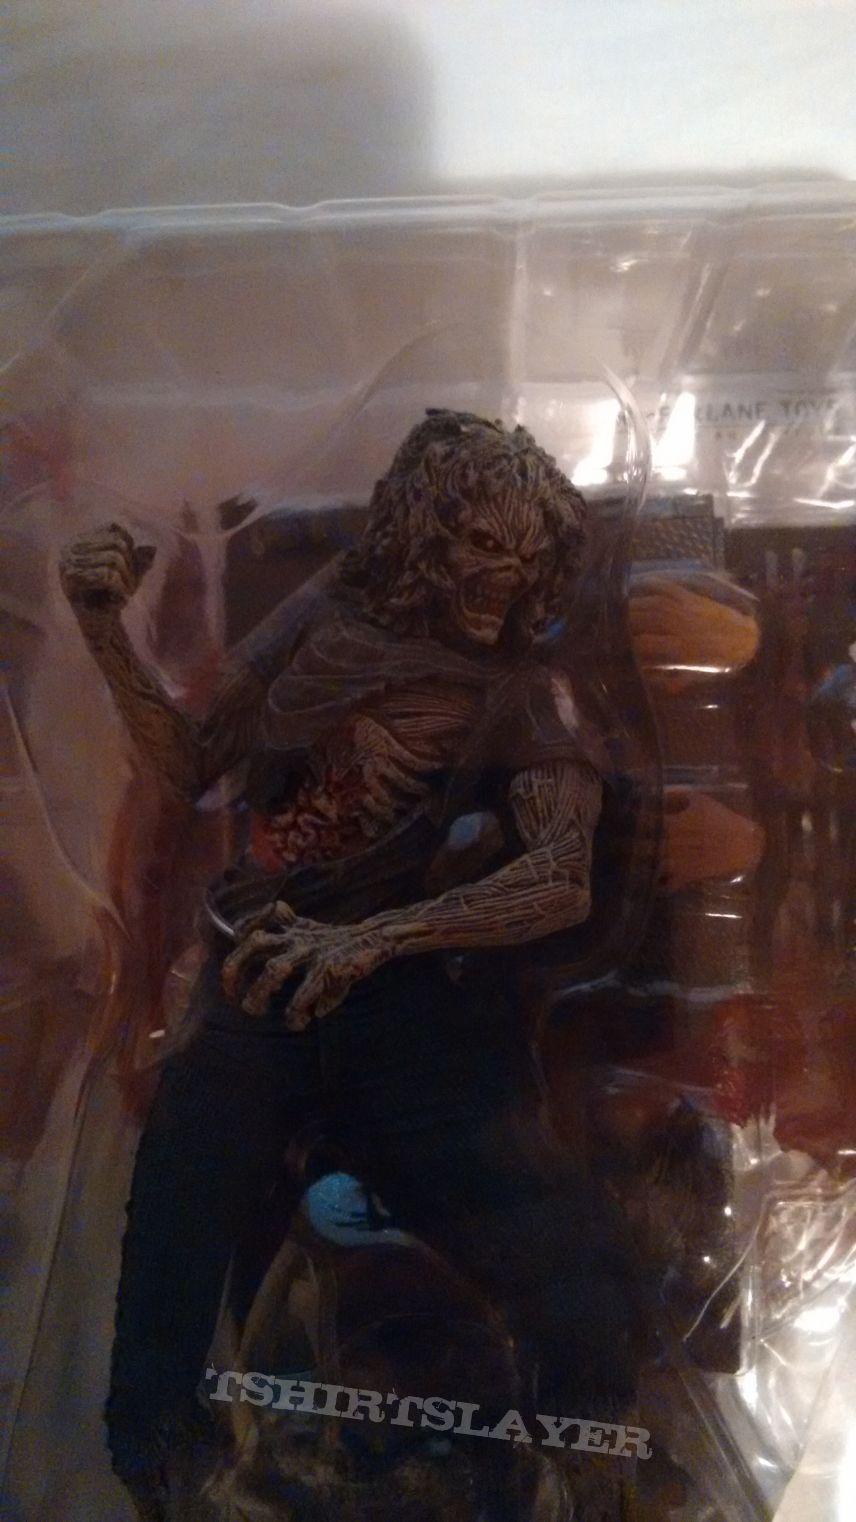 Iron Maiden - Killers Display (McFarlane Toys)